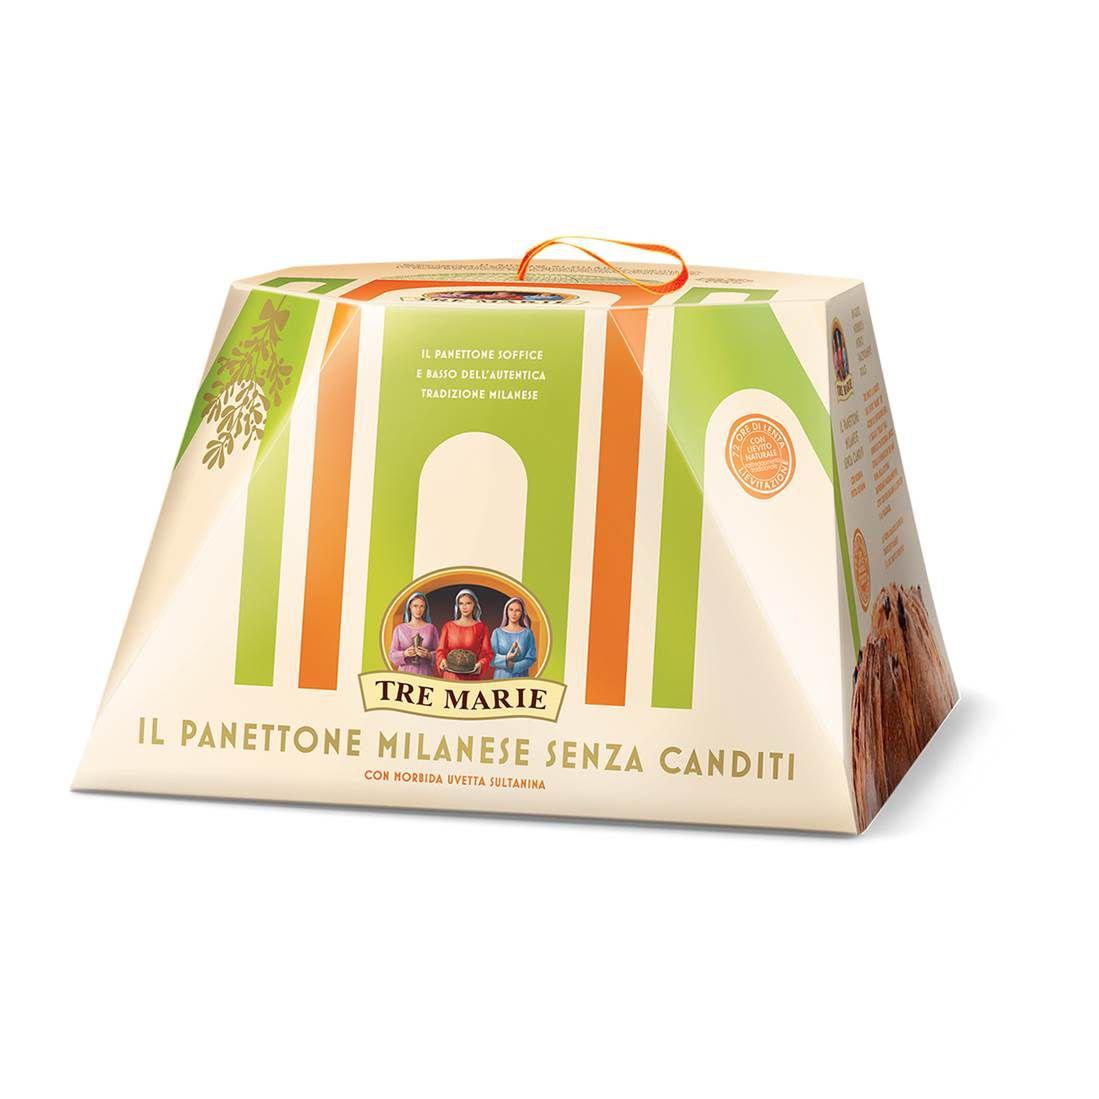 Panetone Milanese Senza Canditi Tre Marie 1kg